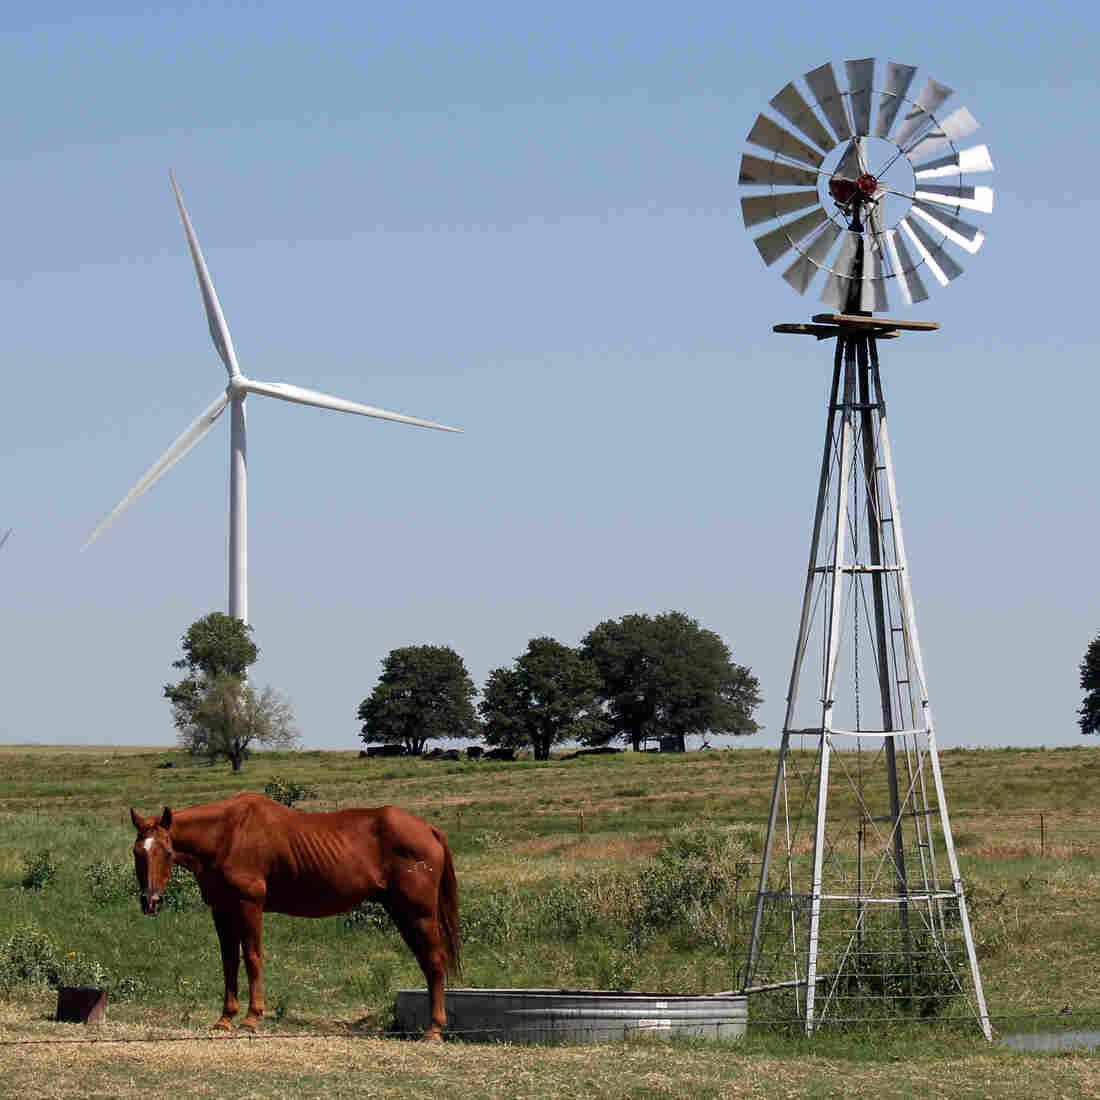 Oklahoma Wind Power Companies Run Into Headwinds